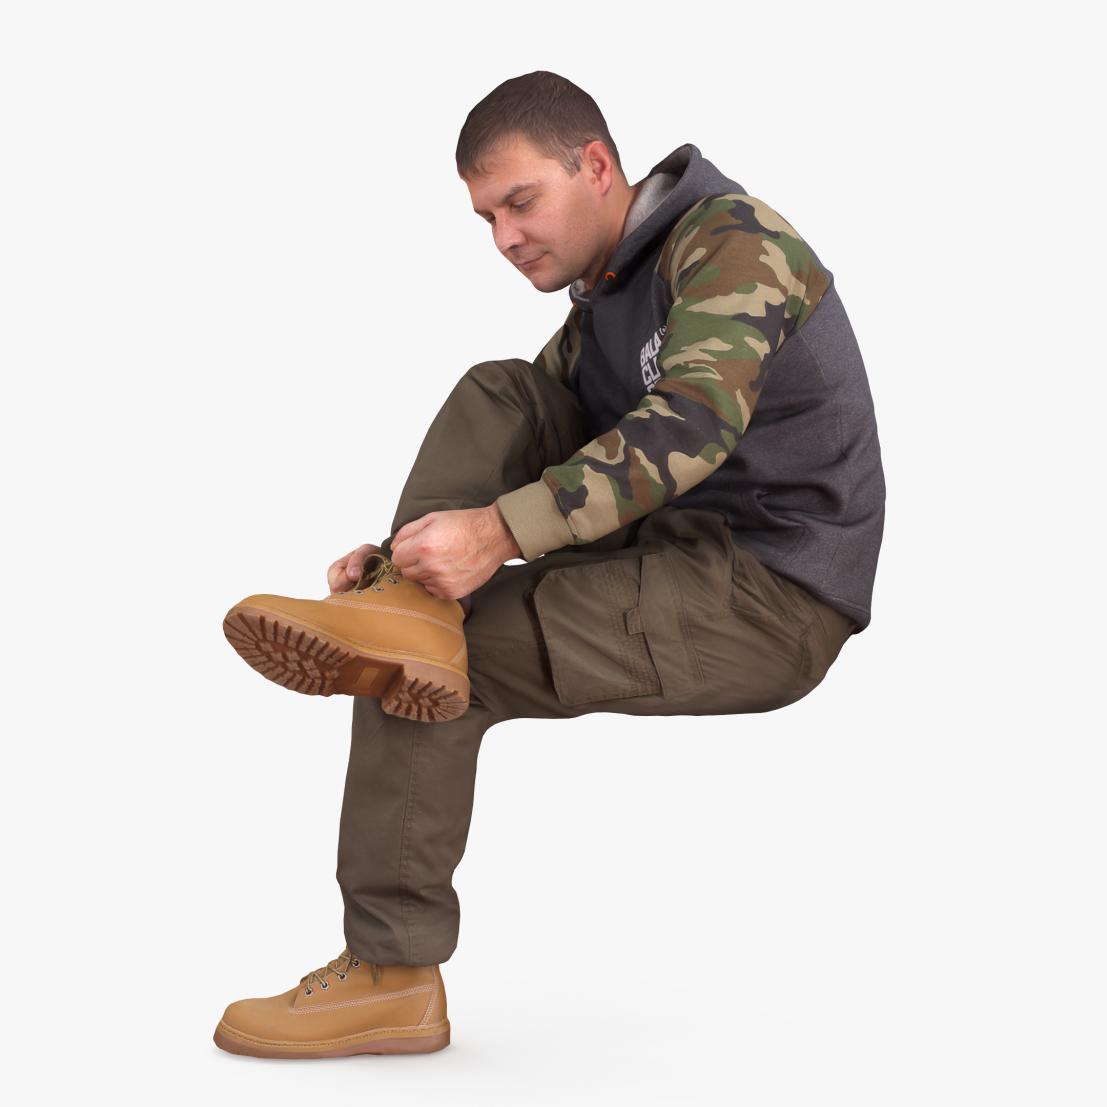 Urban Man Sitting 3D Model | 3DTree Scanning Studio